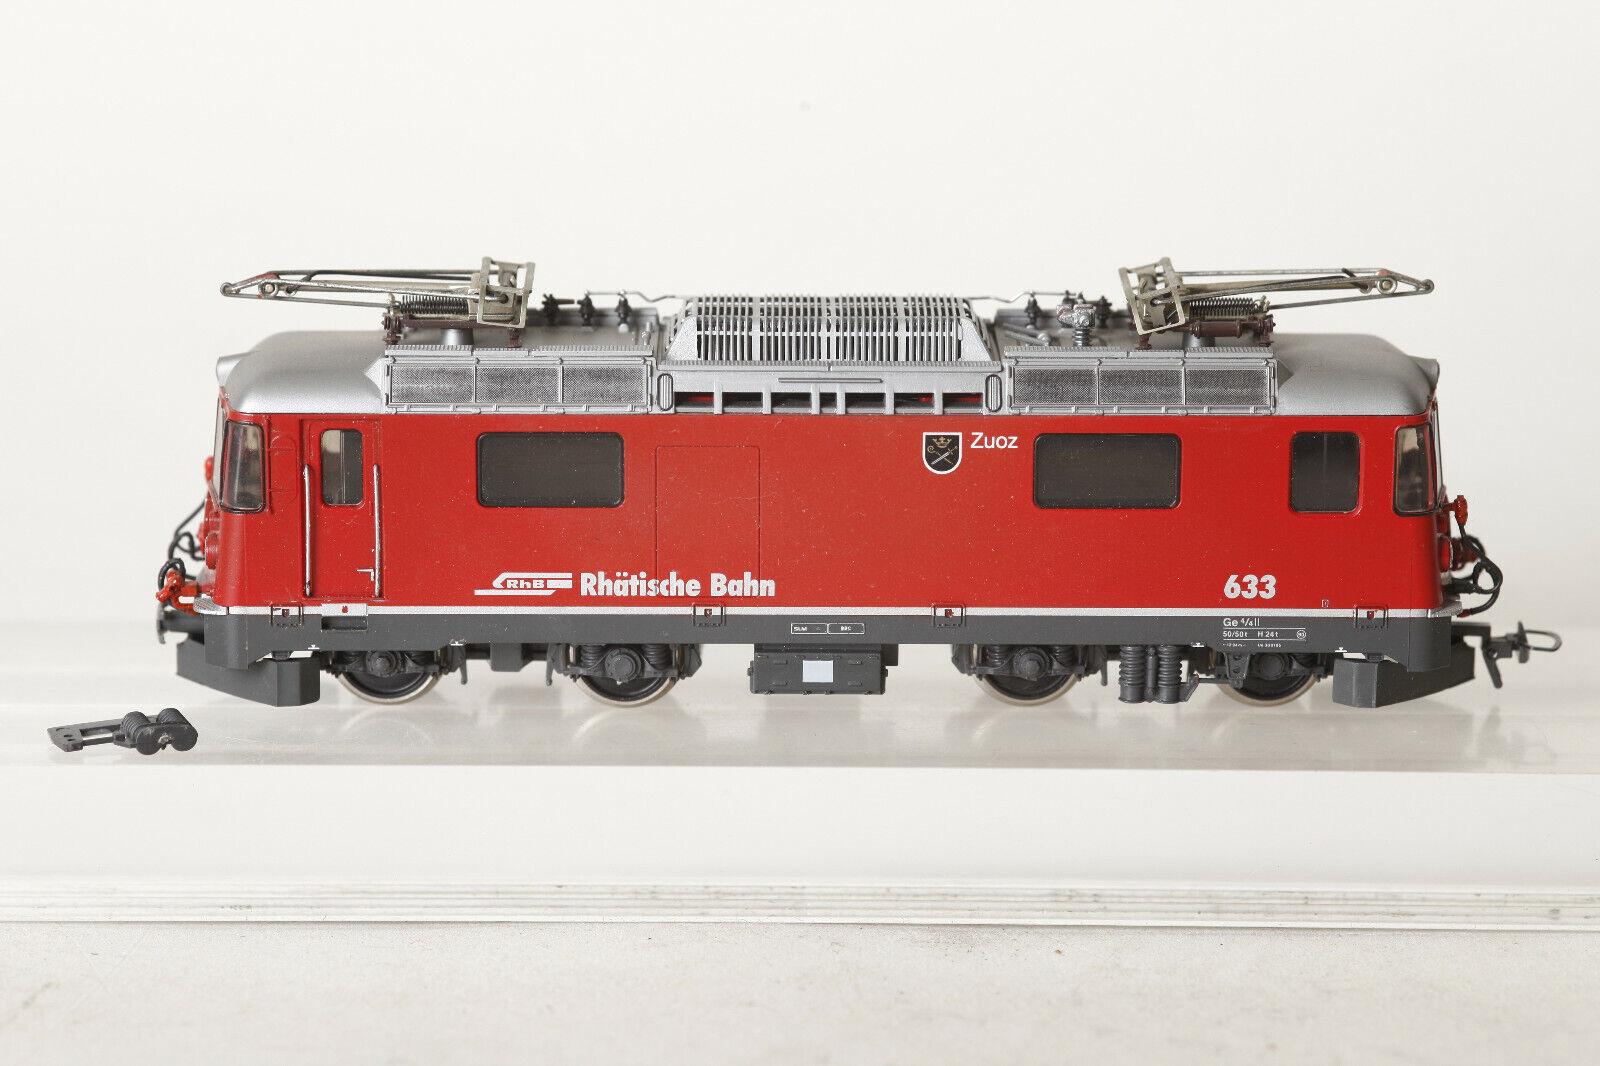 Bemo H0m 1258 123 Locomotora Eléctrica Rhb Zuoz N º 633 Rojo Ge 4 4 i (93798)